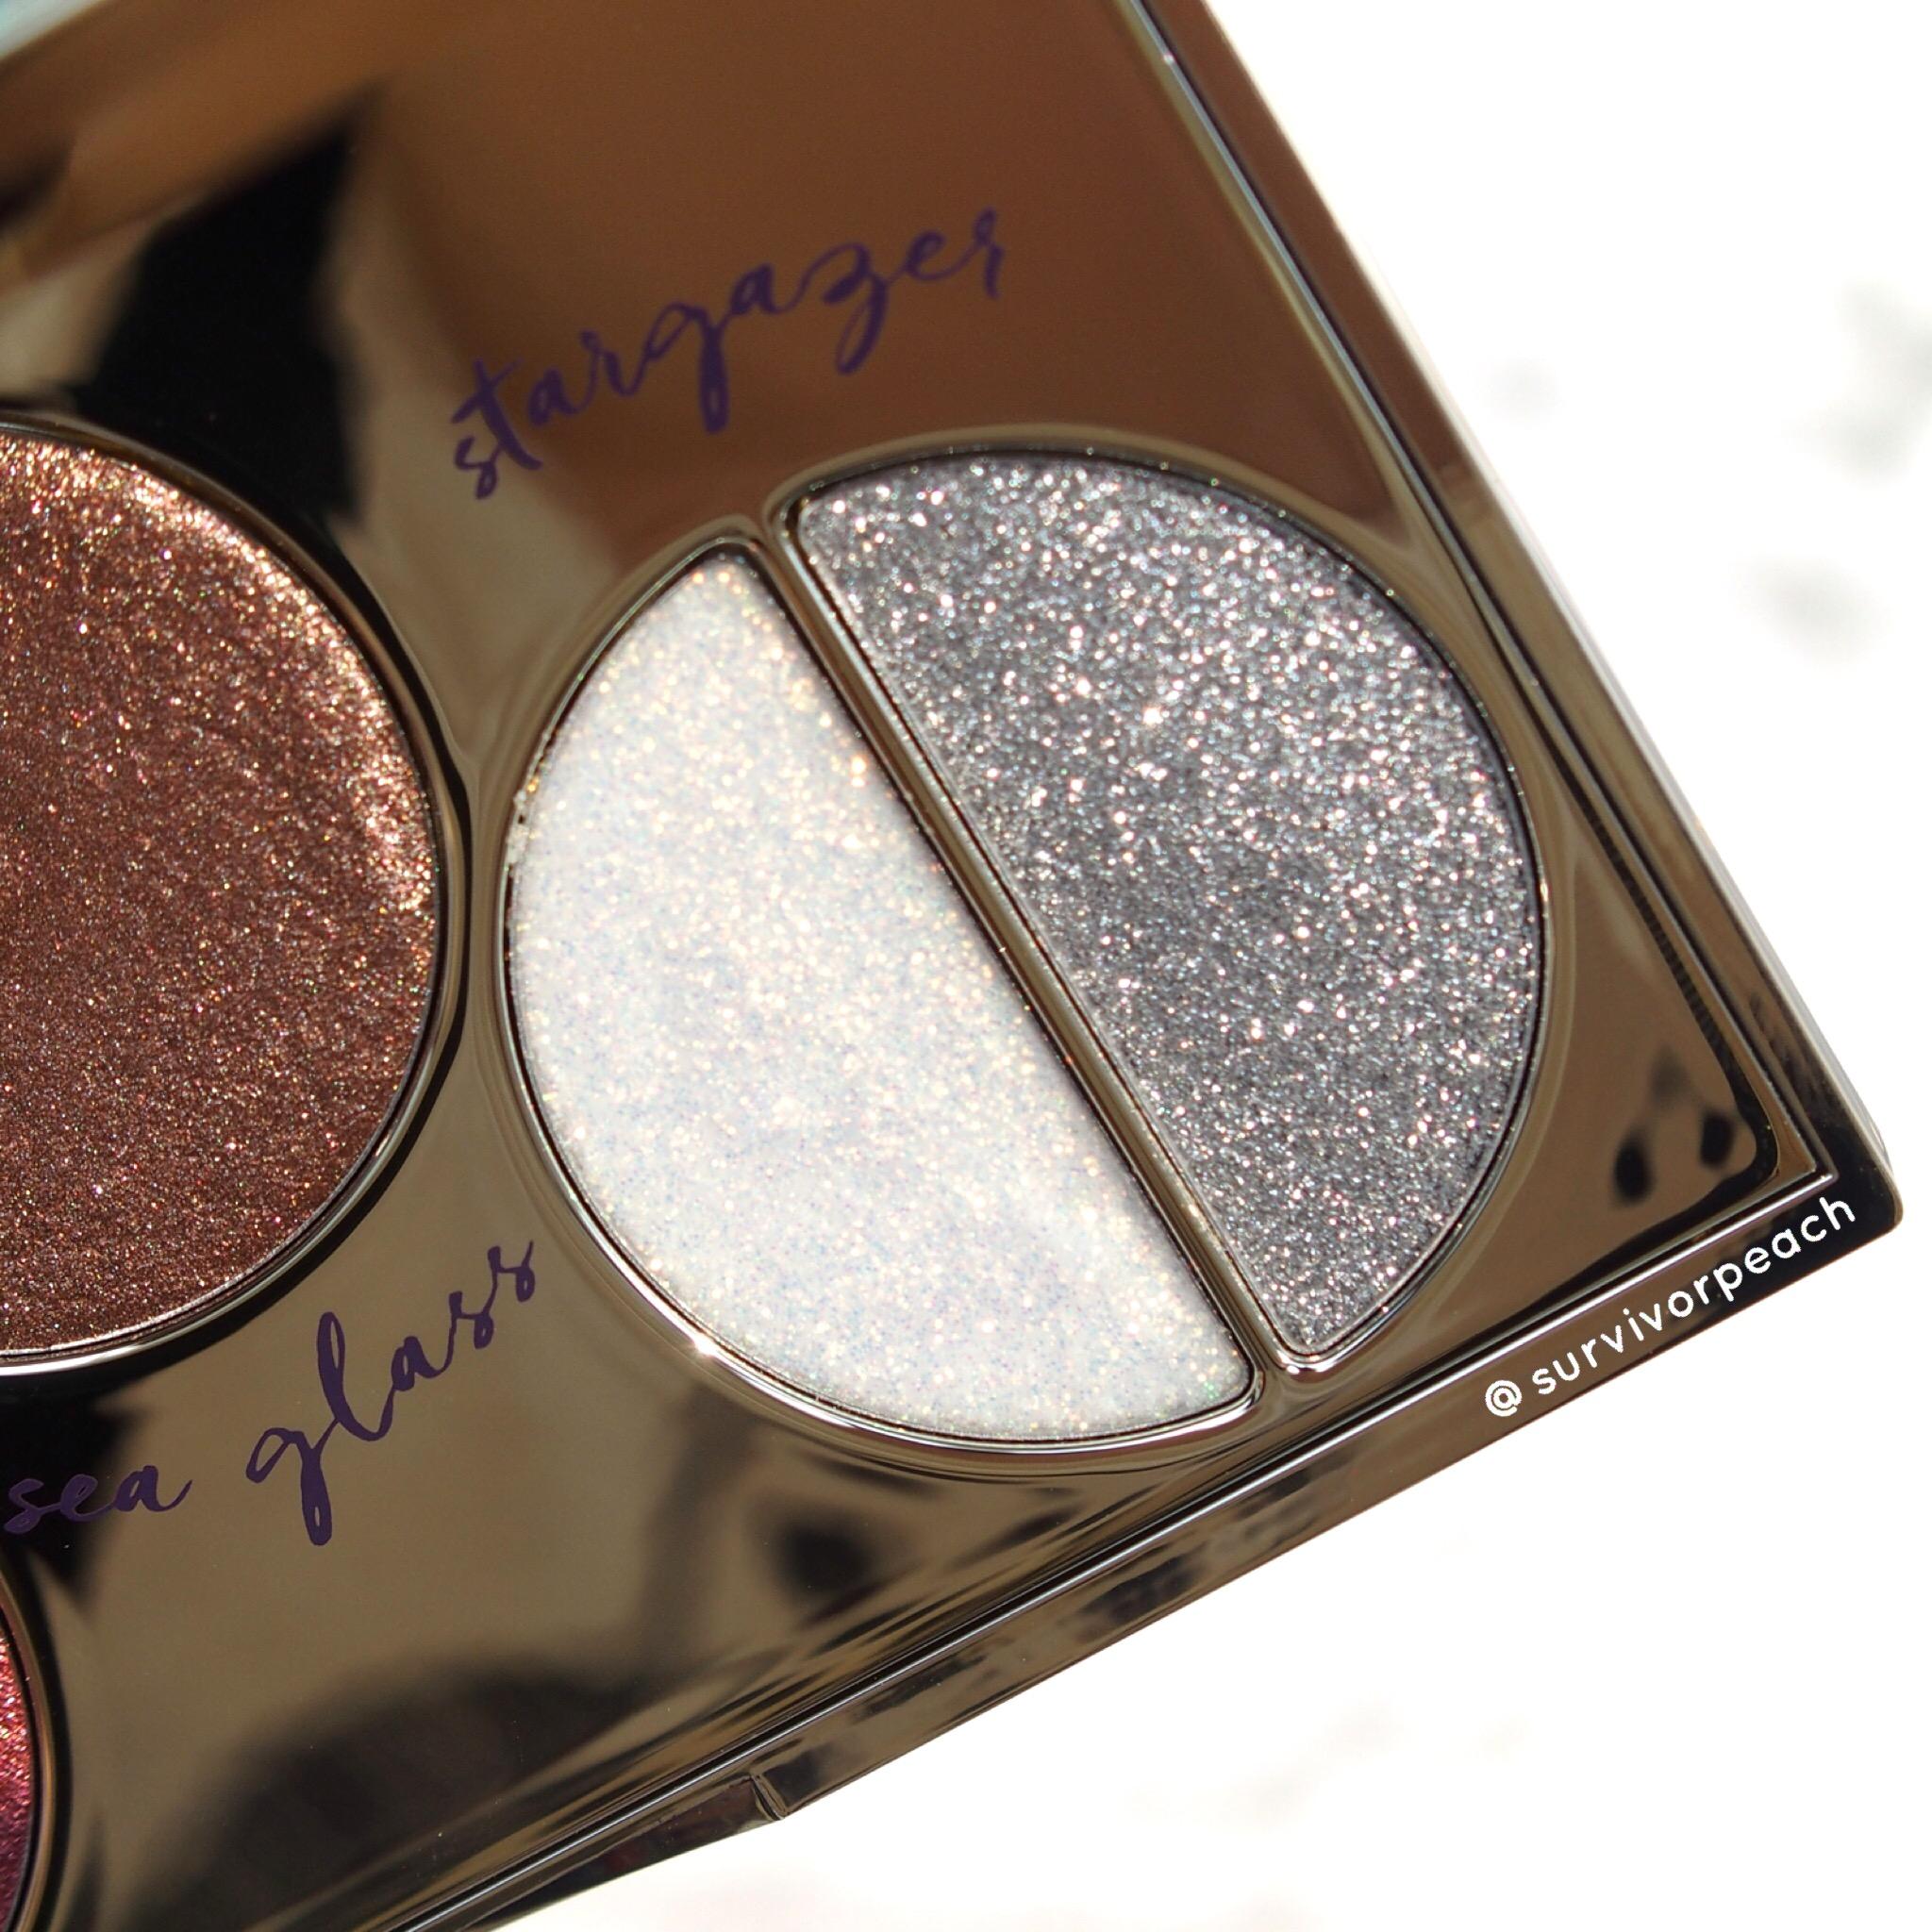 Tarte Foiled Fingers eyeshadow palette - Glitter shades